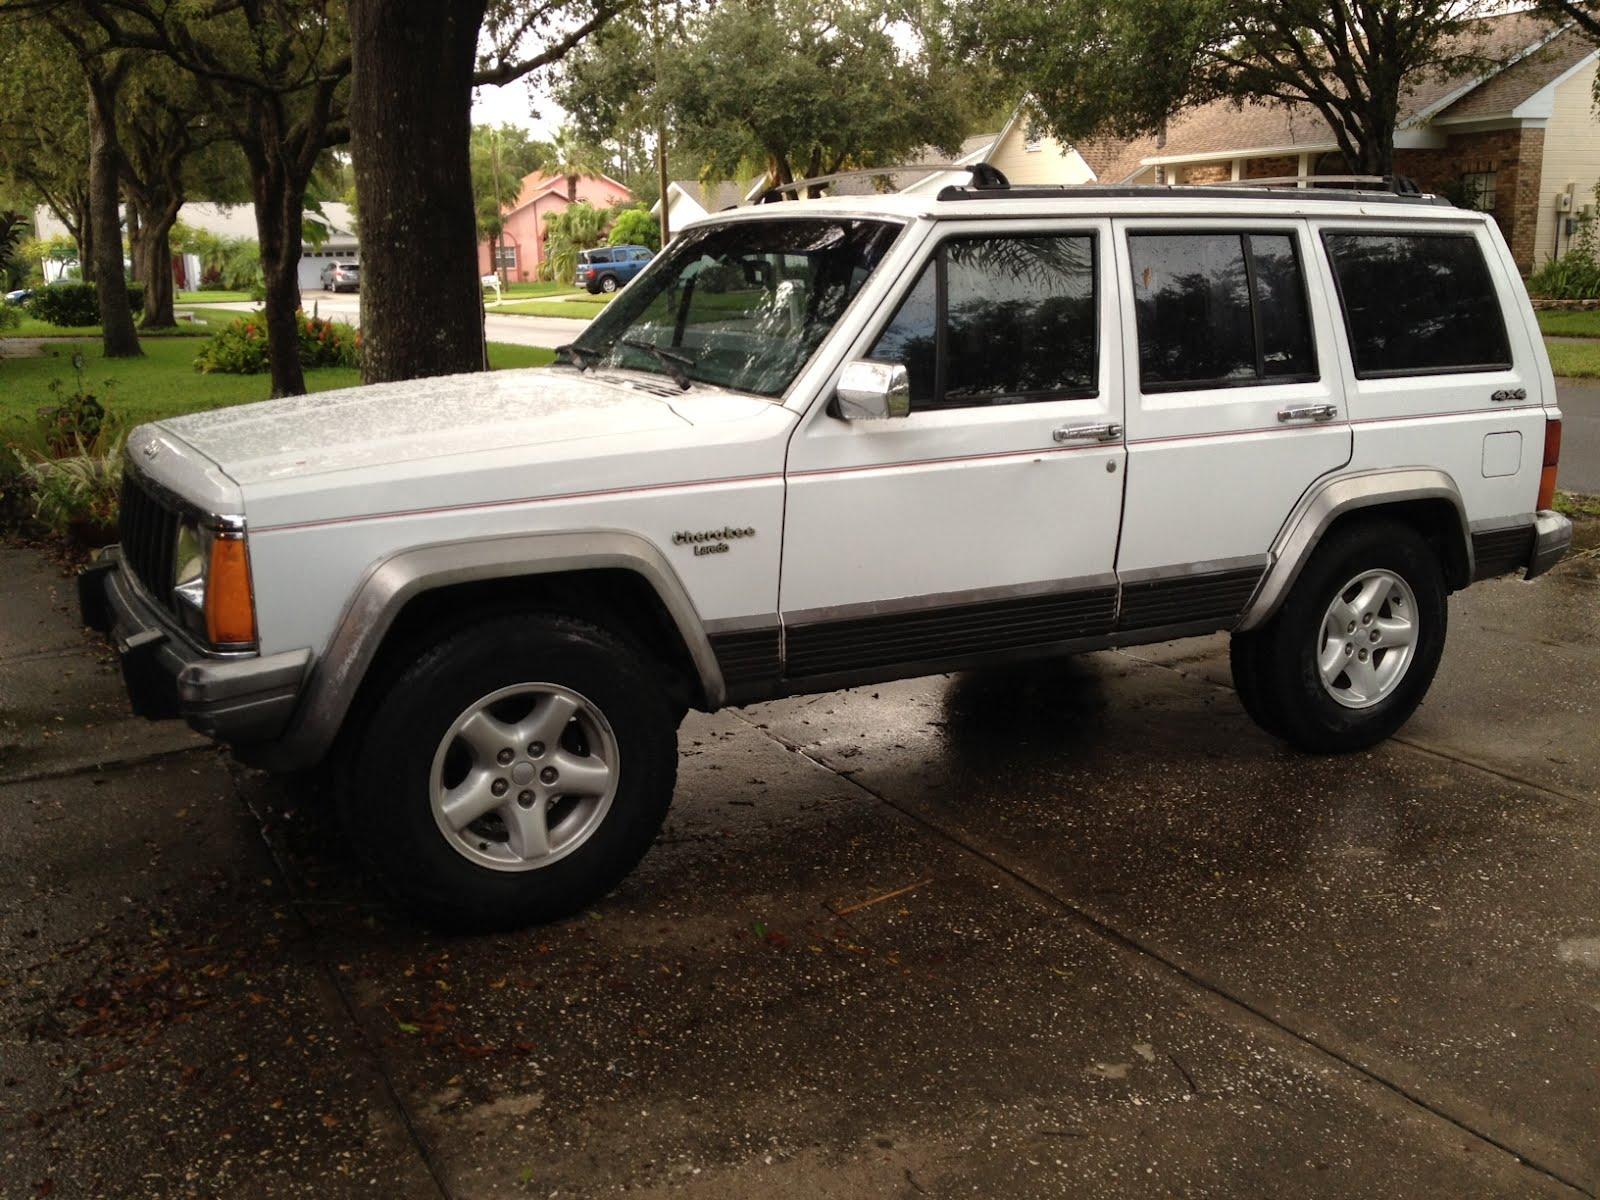 New Toy 1992 Jeep Cherokee Xj 4x4